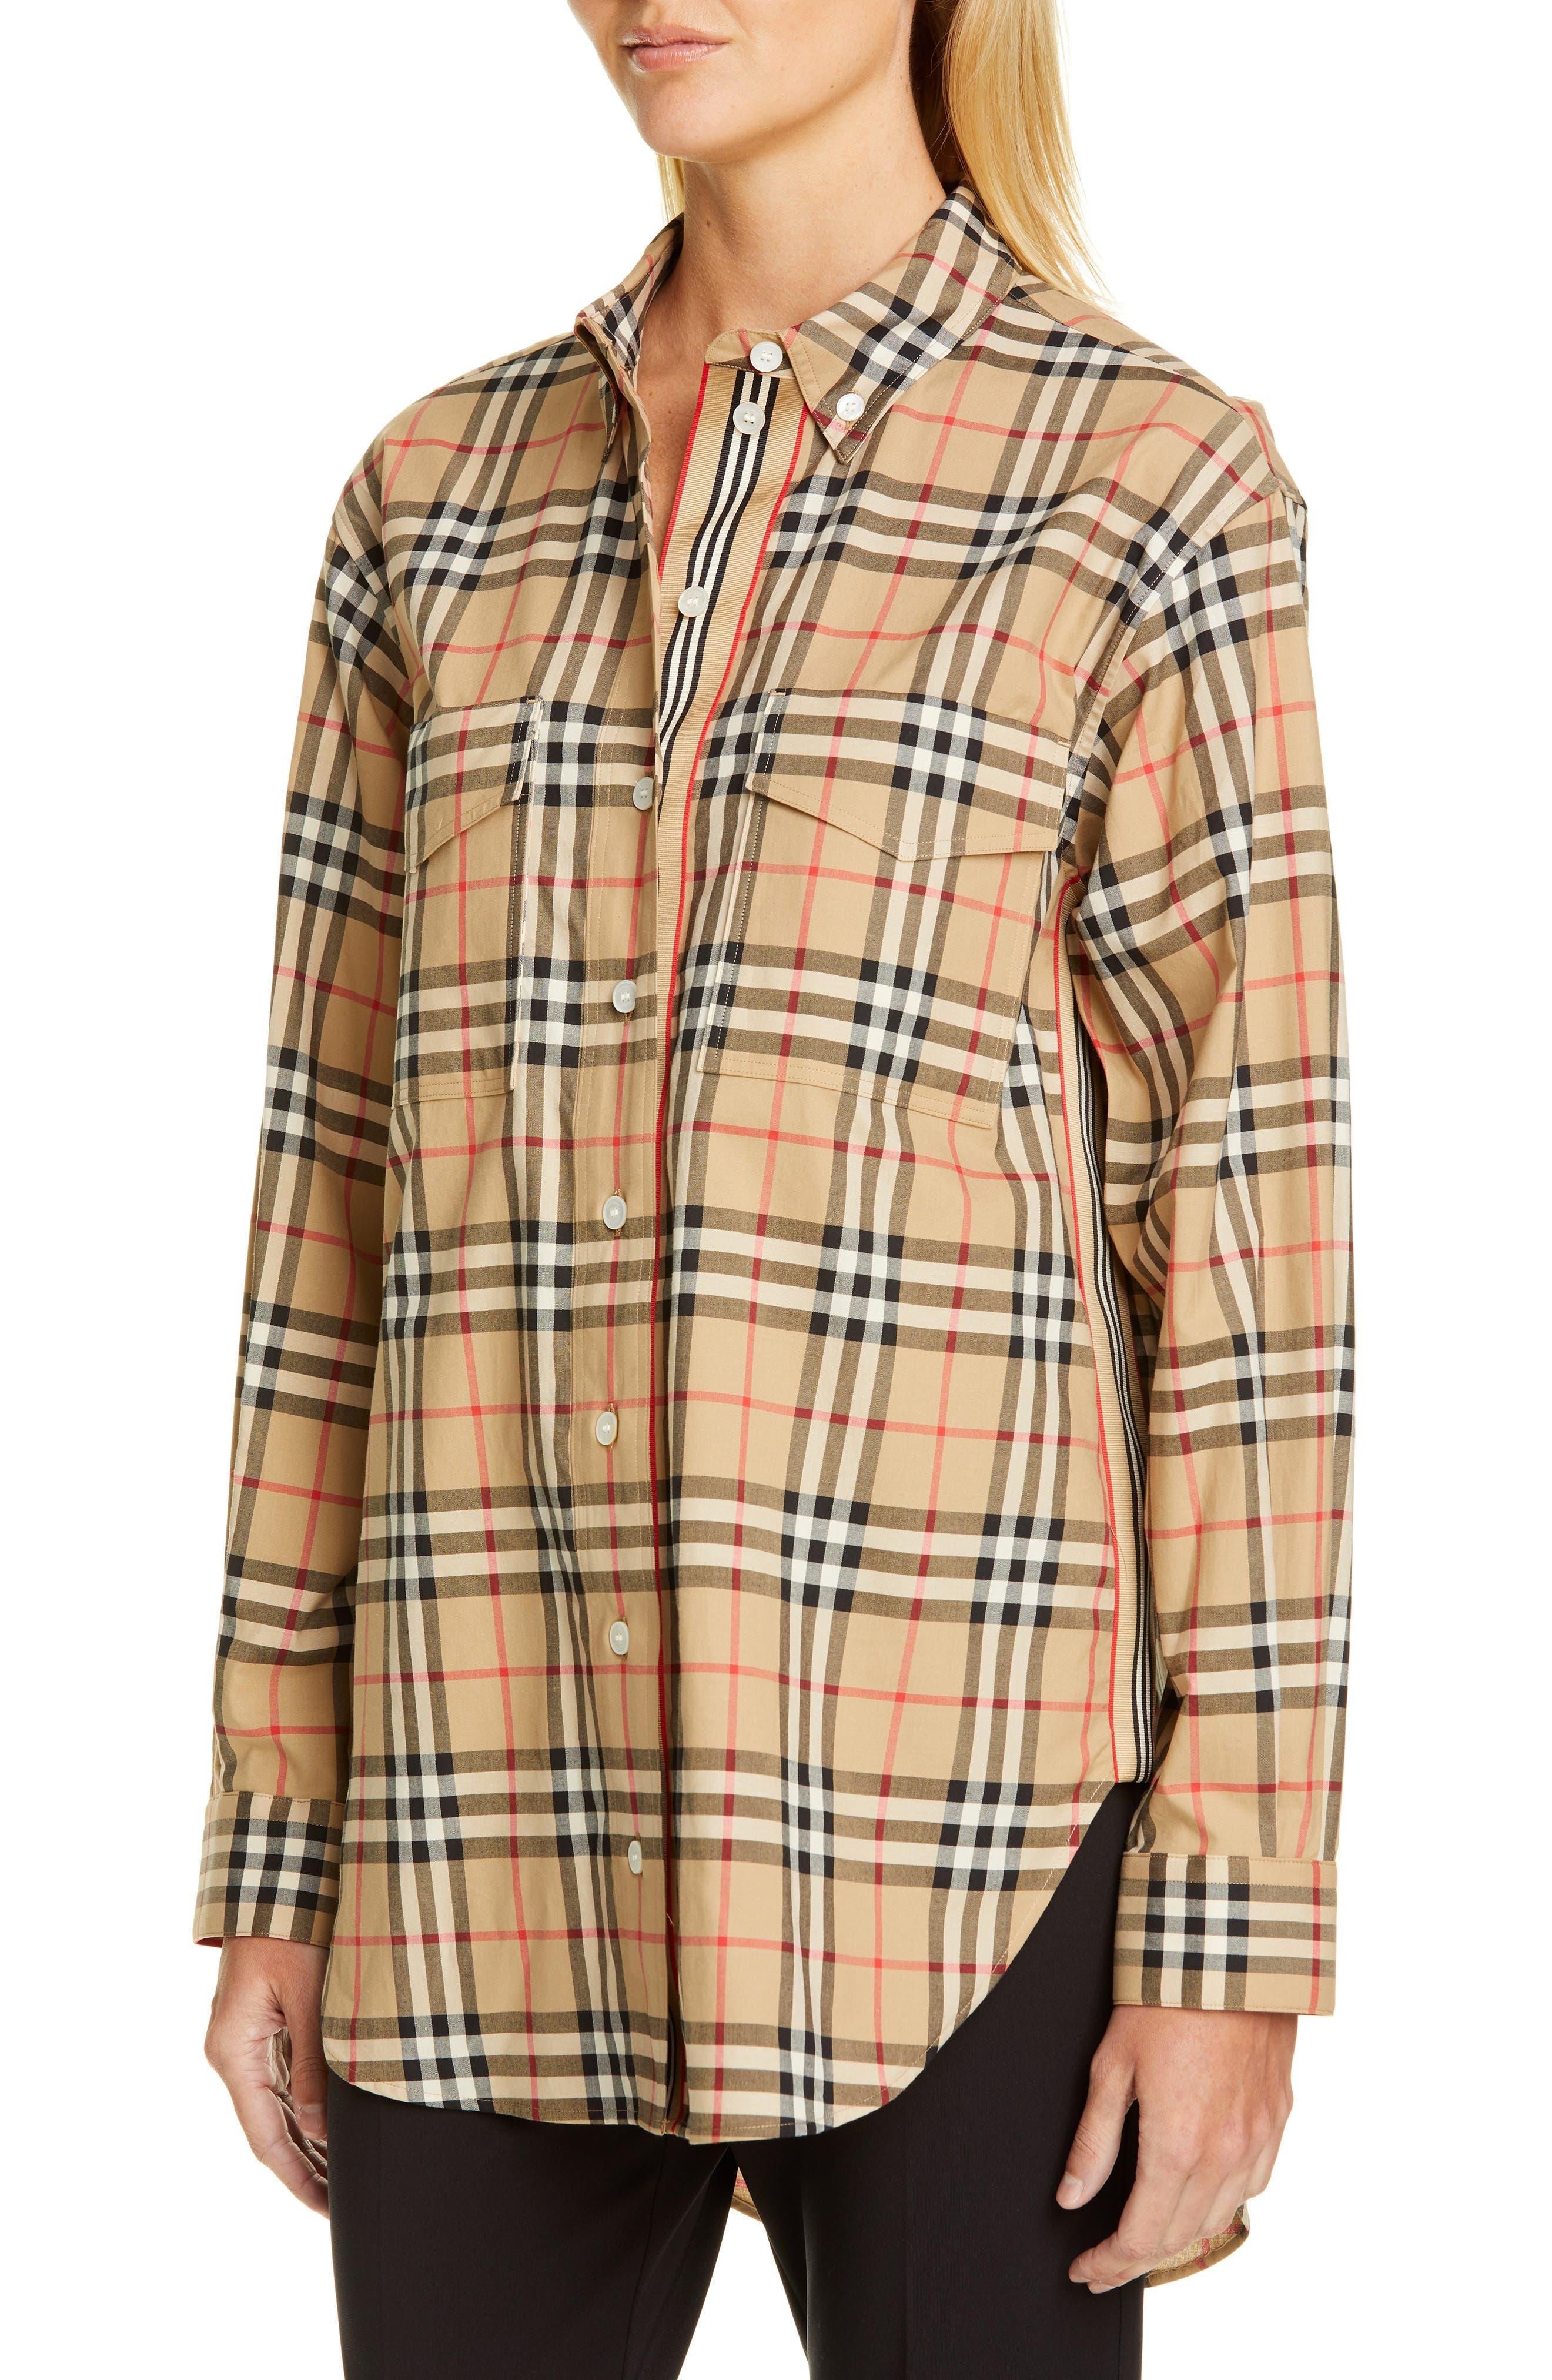 BURBERRY, Turnstone Check Shirt, Alternate thumbnail 4, color, ARCHIVE BEIGE IP CHK